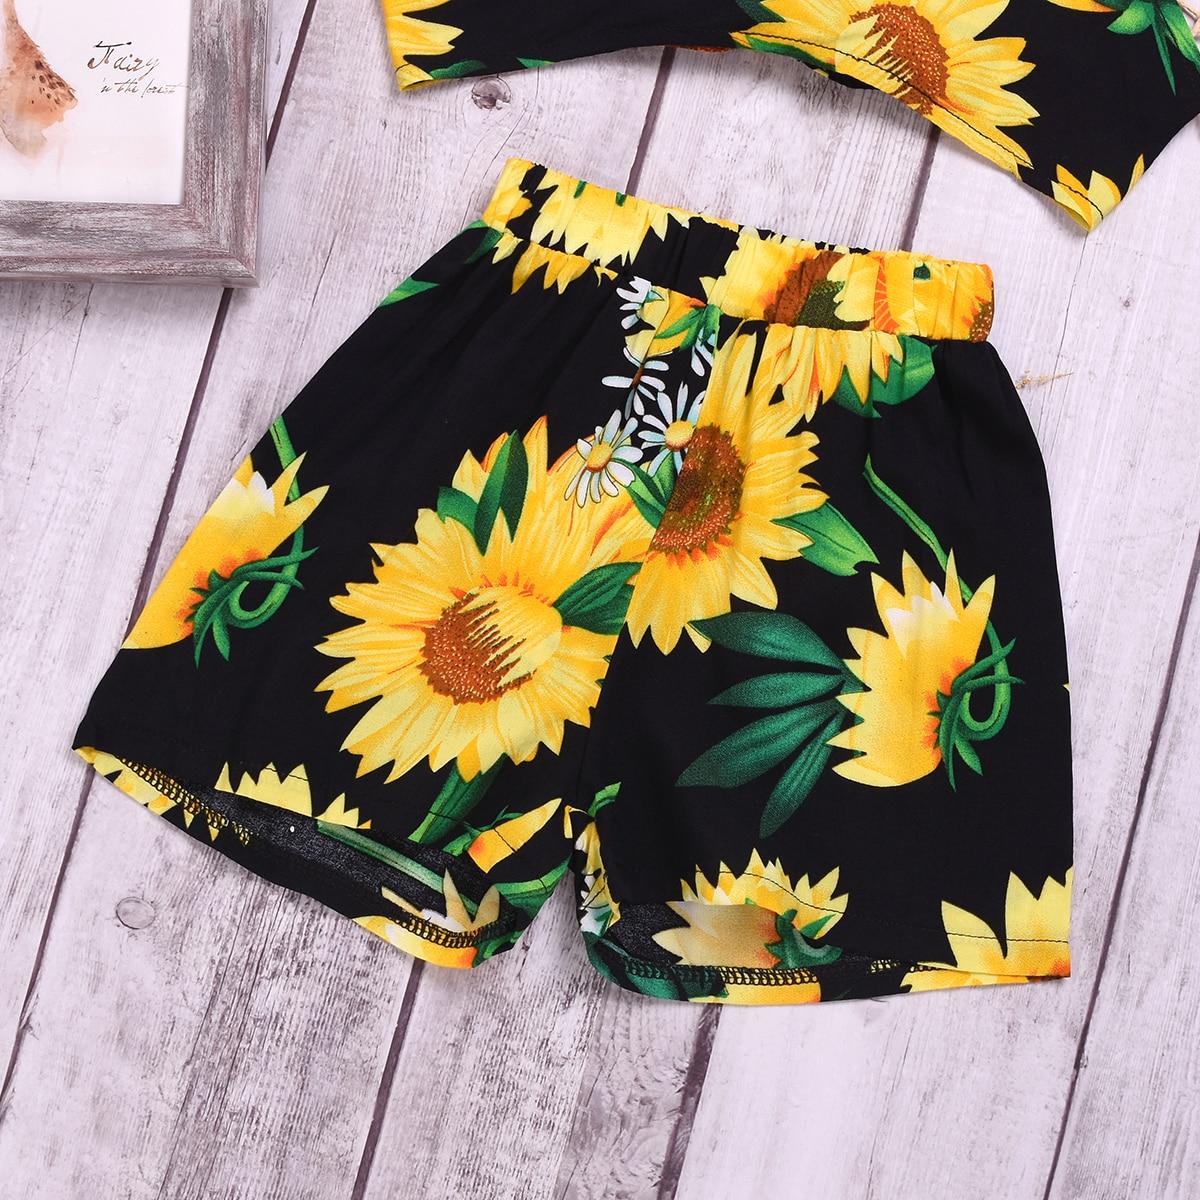 Neugeborenes Baby Mädchen Kleidung Kurzarm Strampler Sonnenblume Shorts Outfits